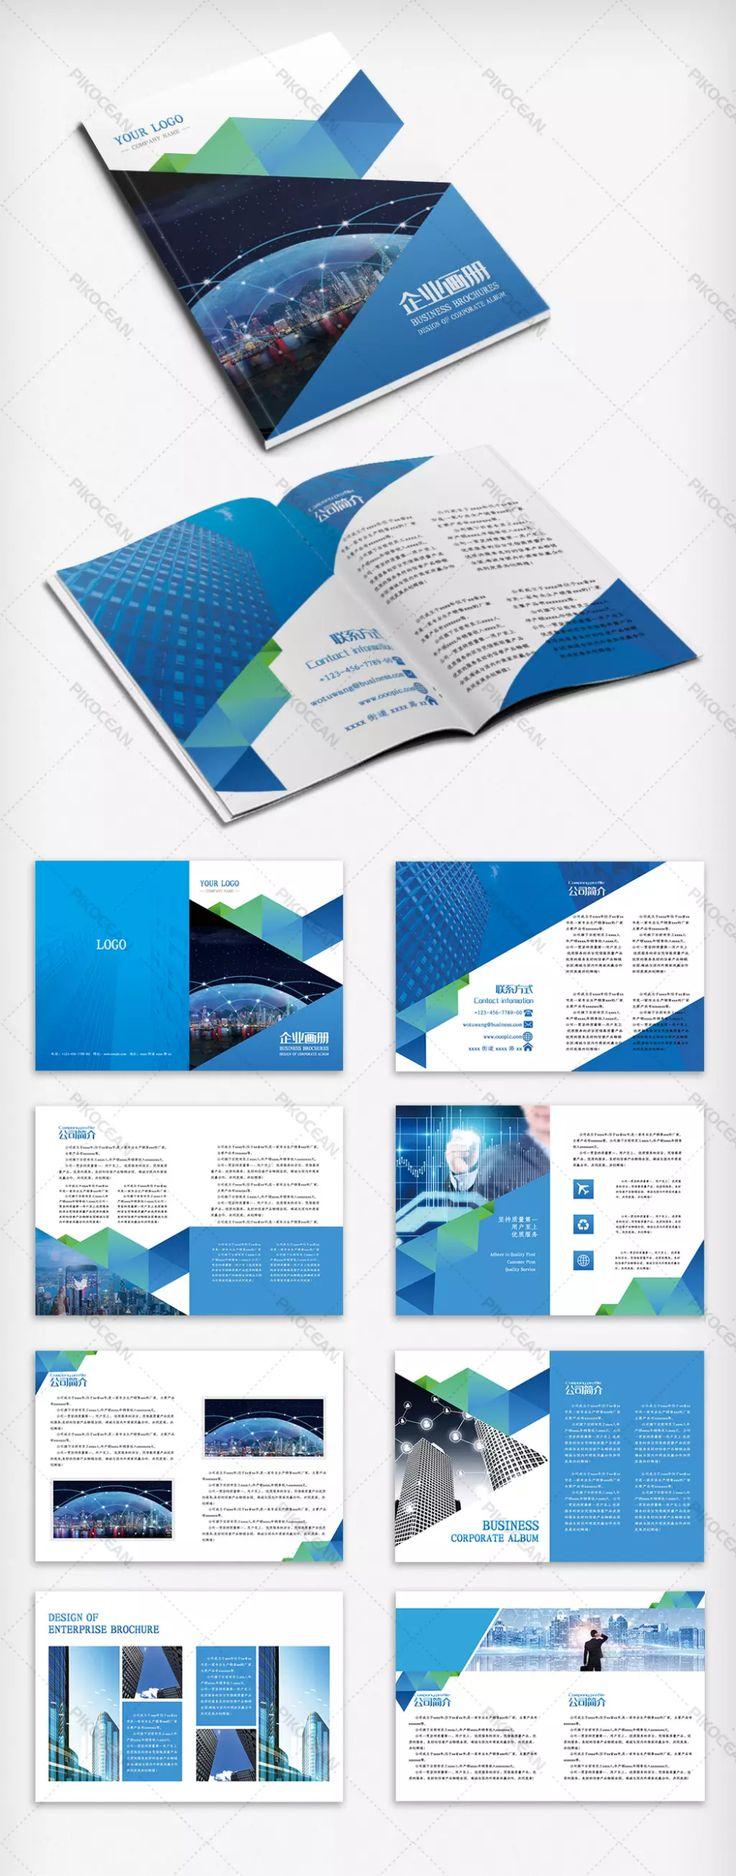 Blue fashion atmosphere technology company general brochure complete set psddownload | Pikocean